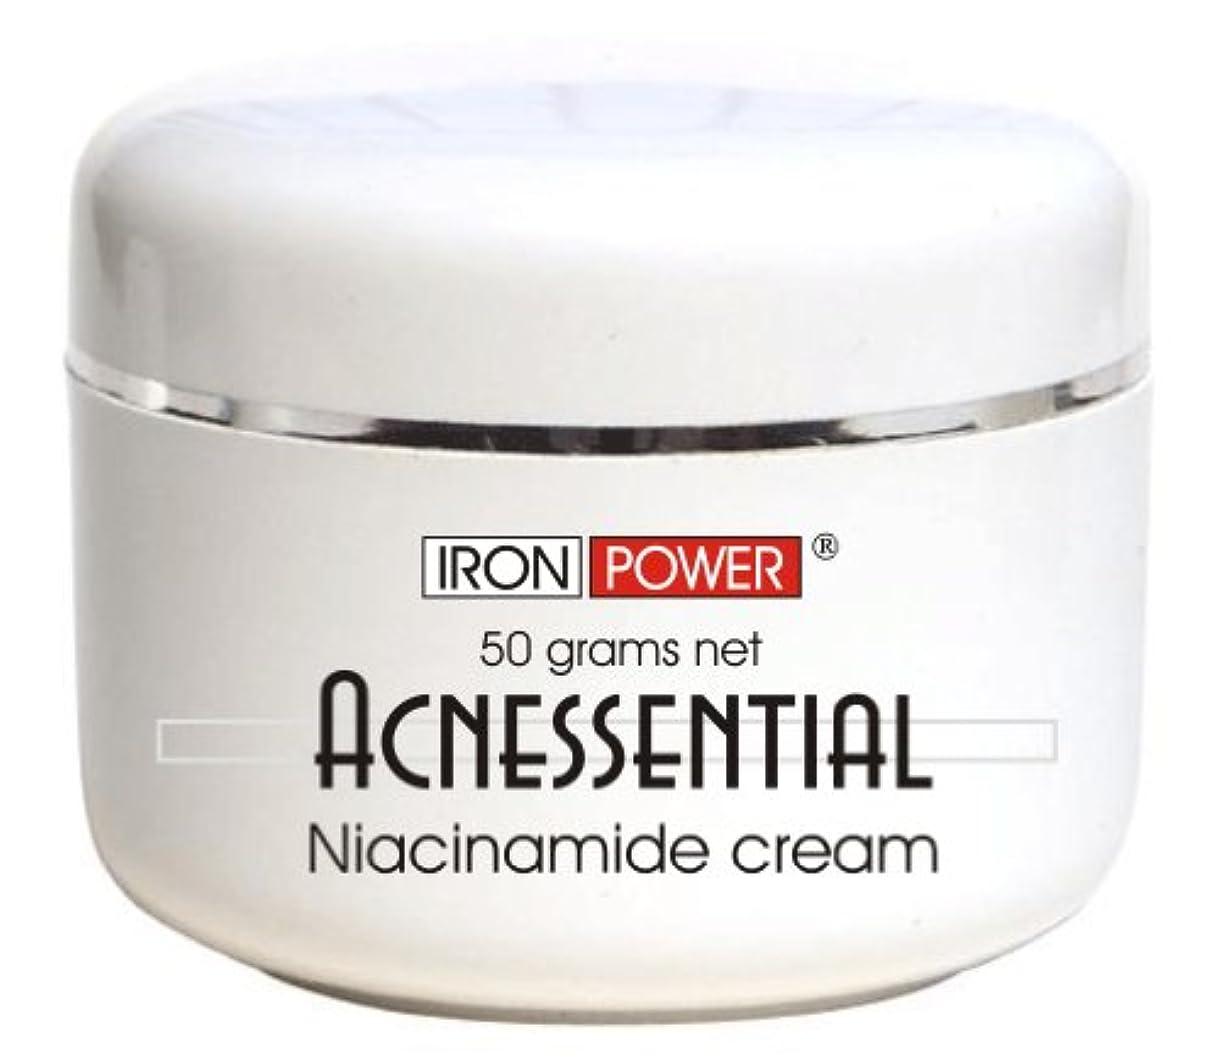 Acnessential 4%話題のナイアシンアミドクリーム| ゲル| ビタミンB3ナイアシンクリーム - ビタミンB3保湿クリーム、50g